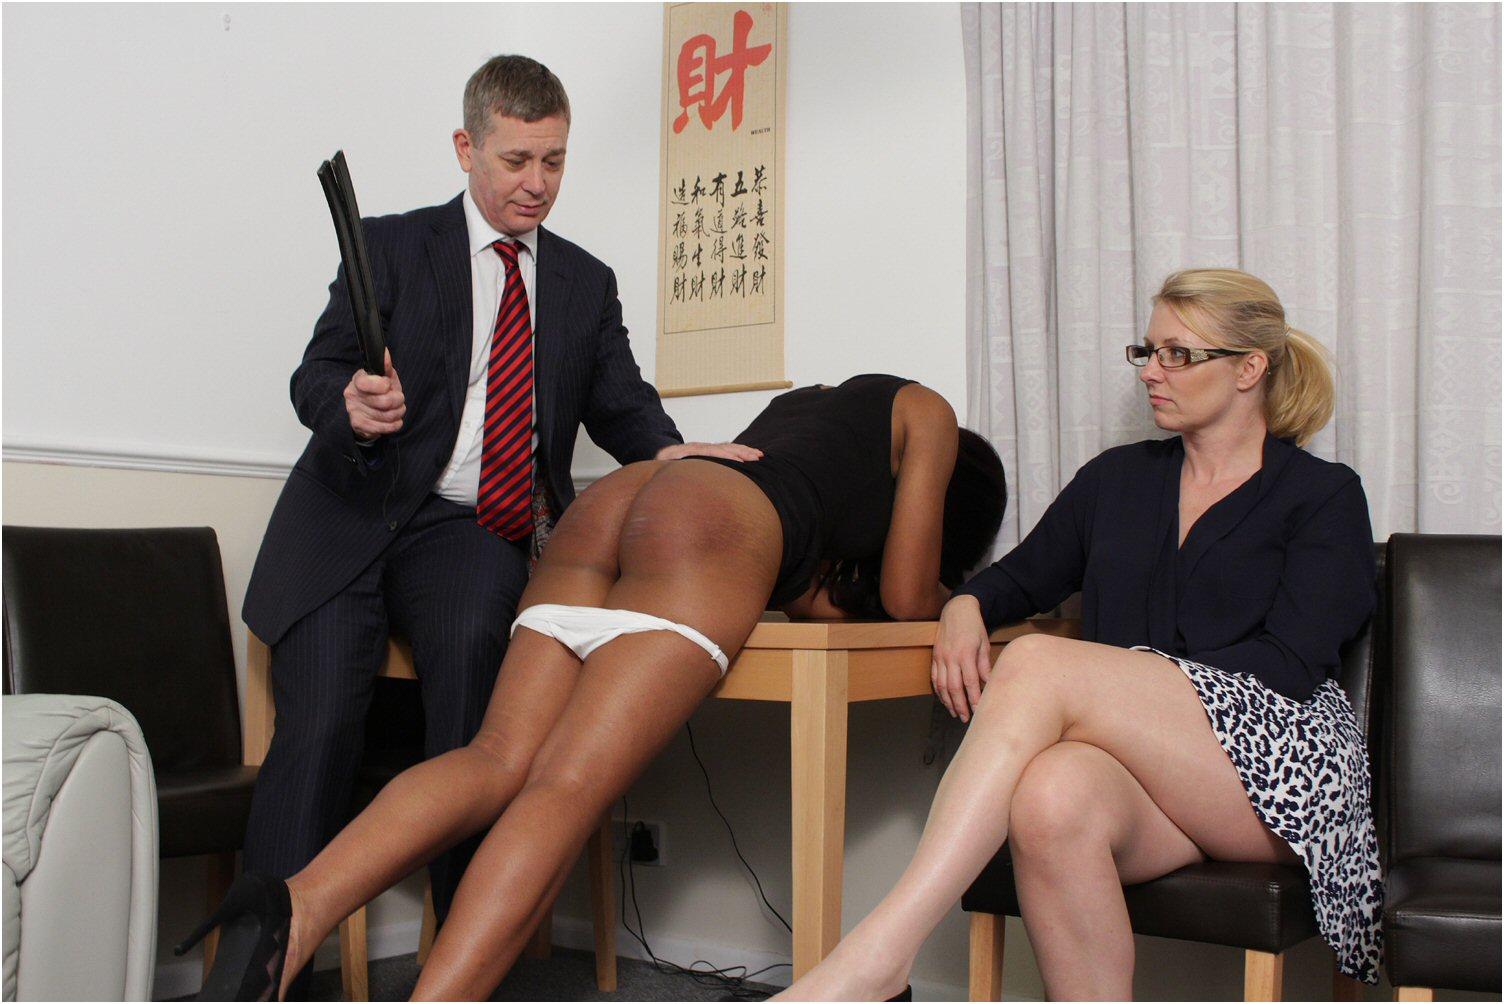 spanking tube.com